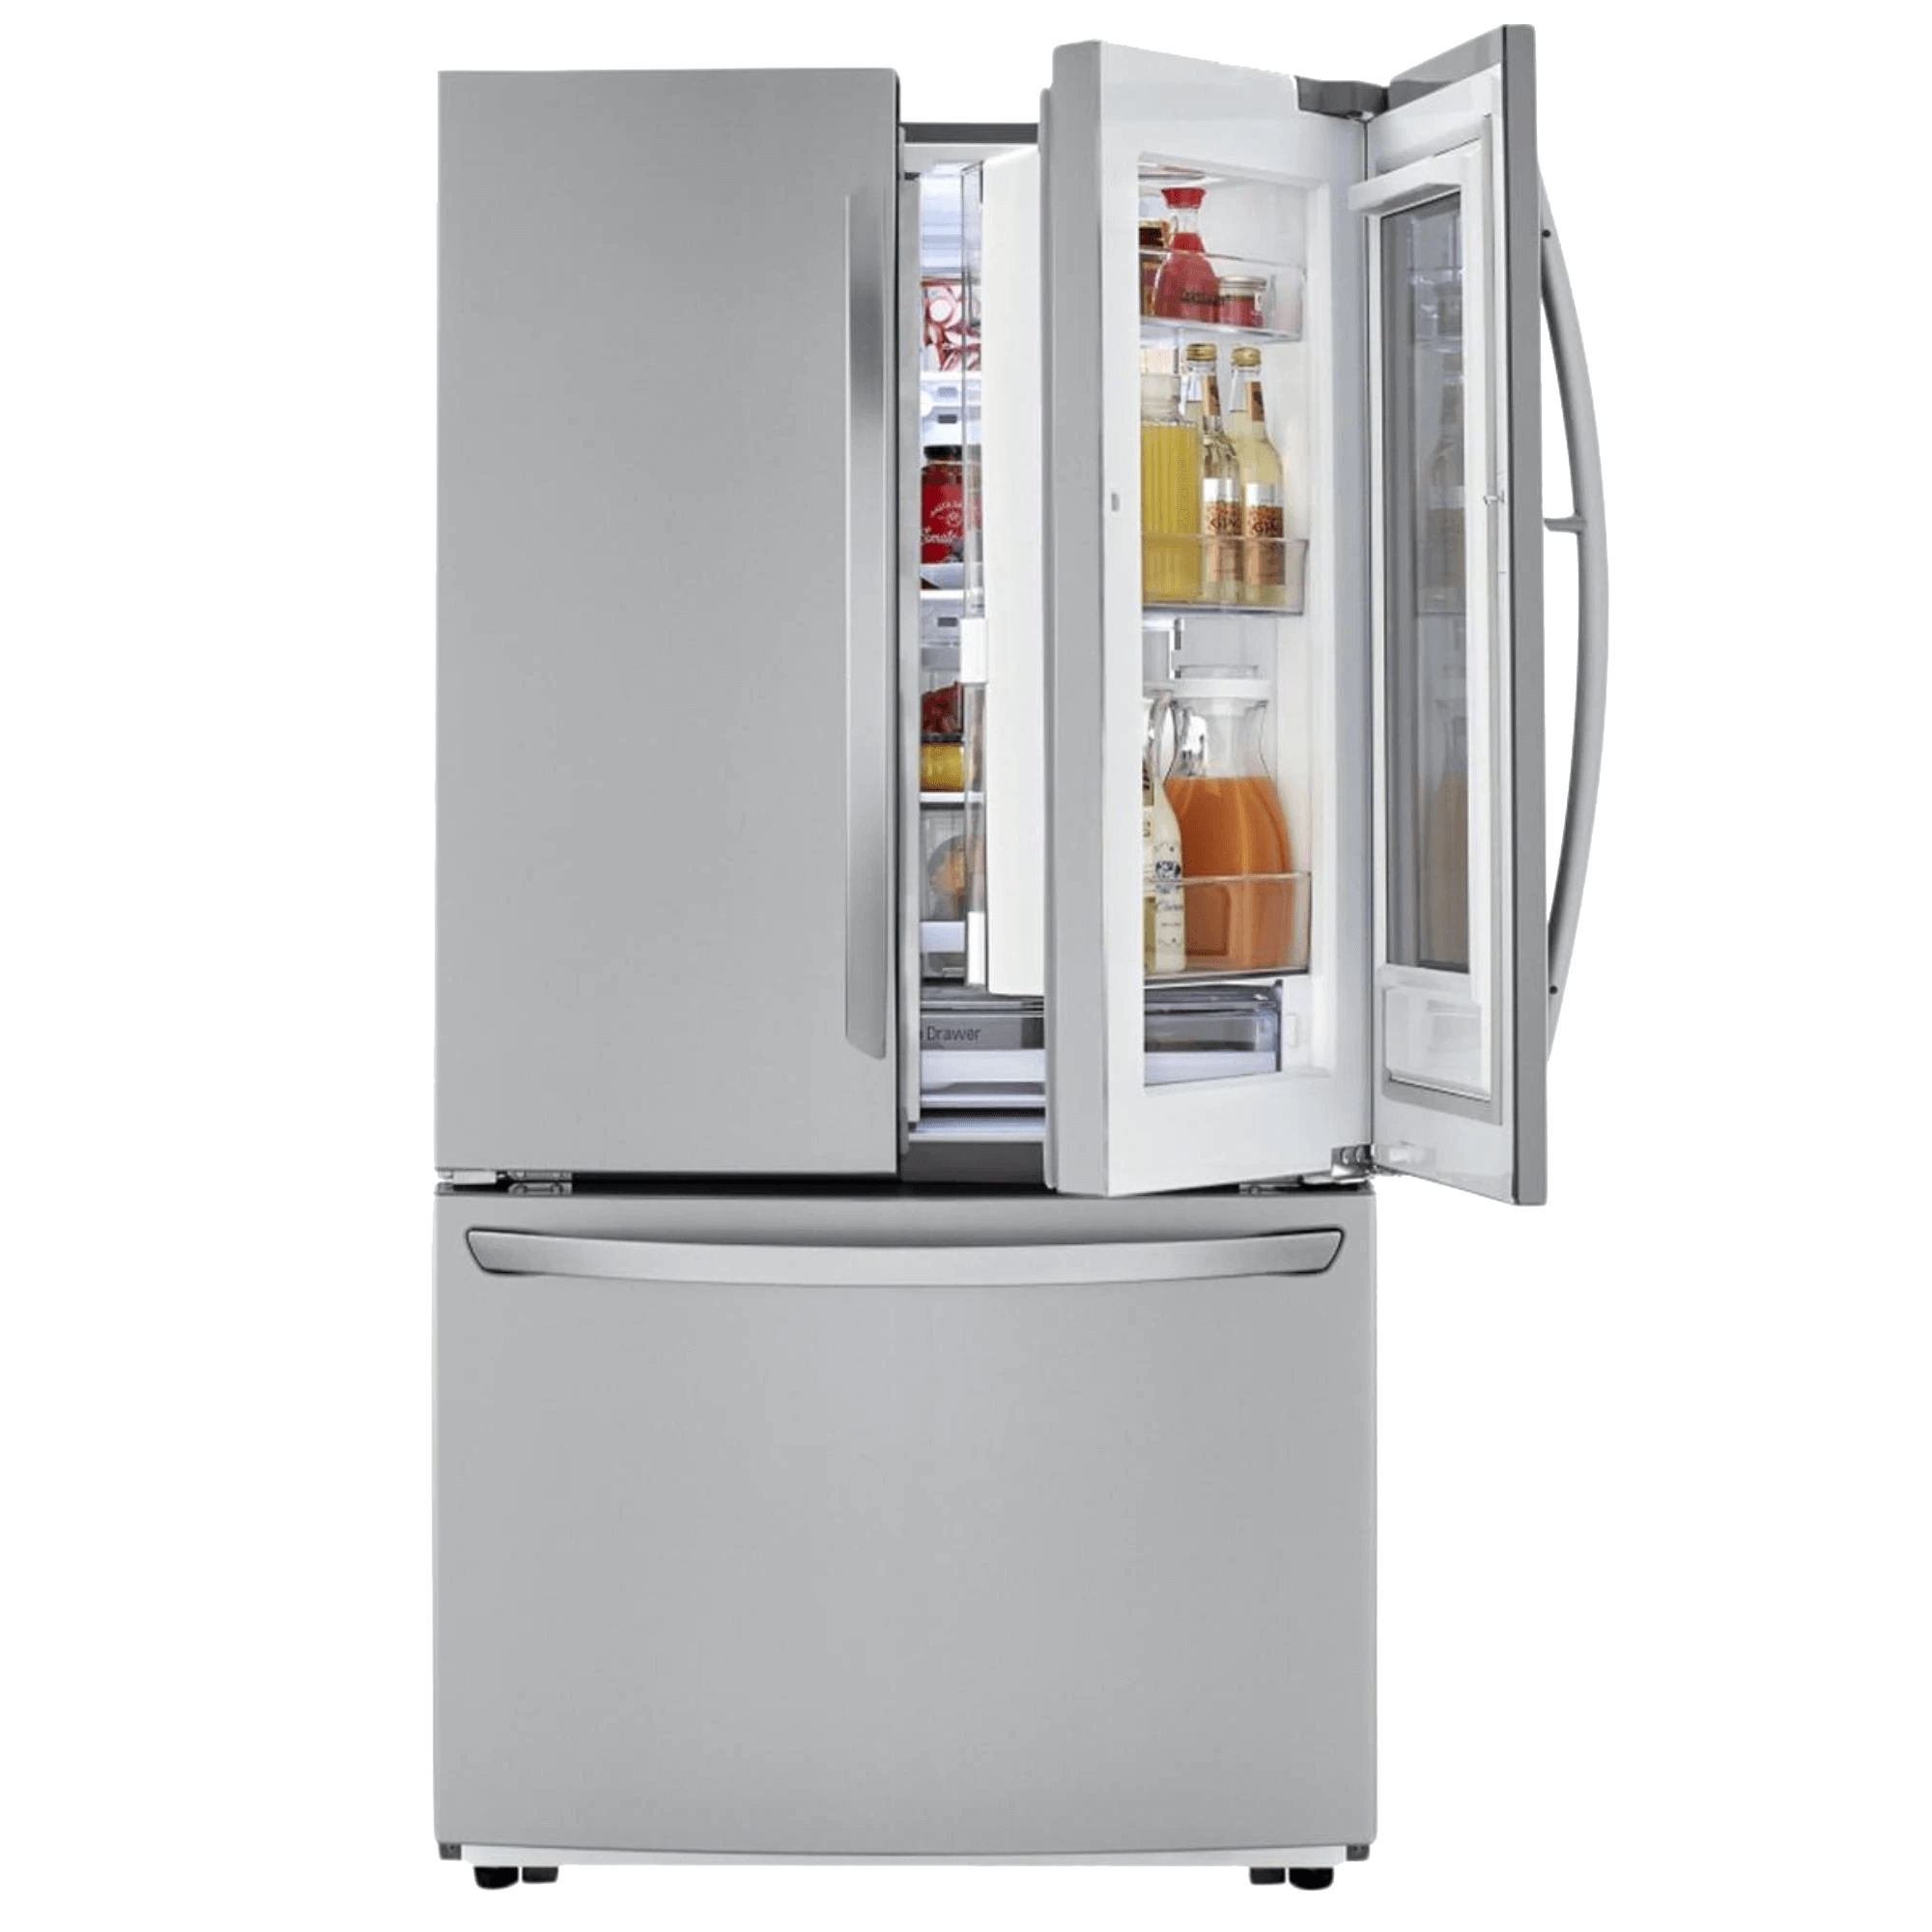 LG Front Display Refridgerator